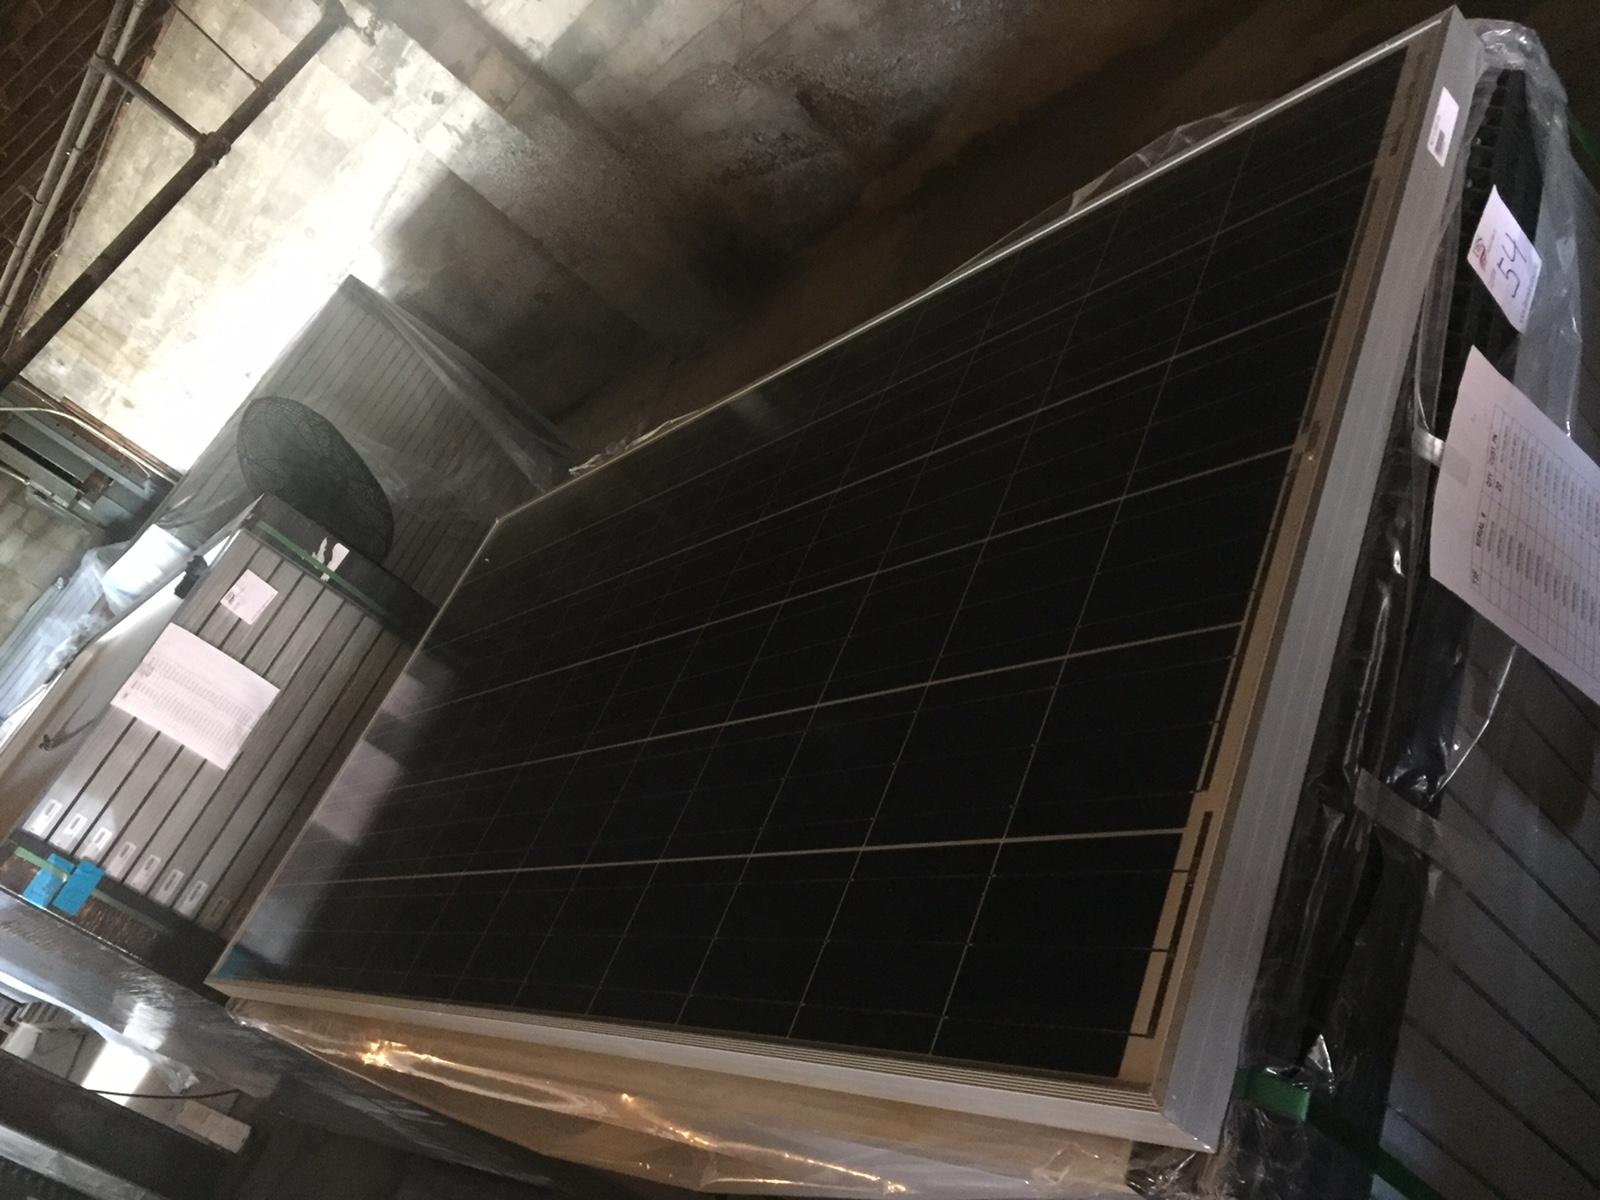 Lot 54 - *NEW LOT* LOT OF (27) 290 WATT SOLAR PANELS - (BIDDING IS PER PANEL MULTIPLIED BY 27)